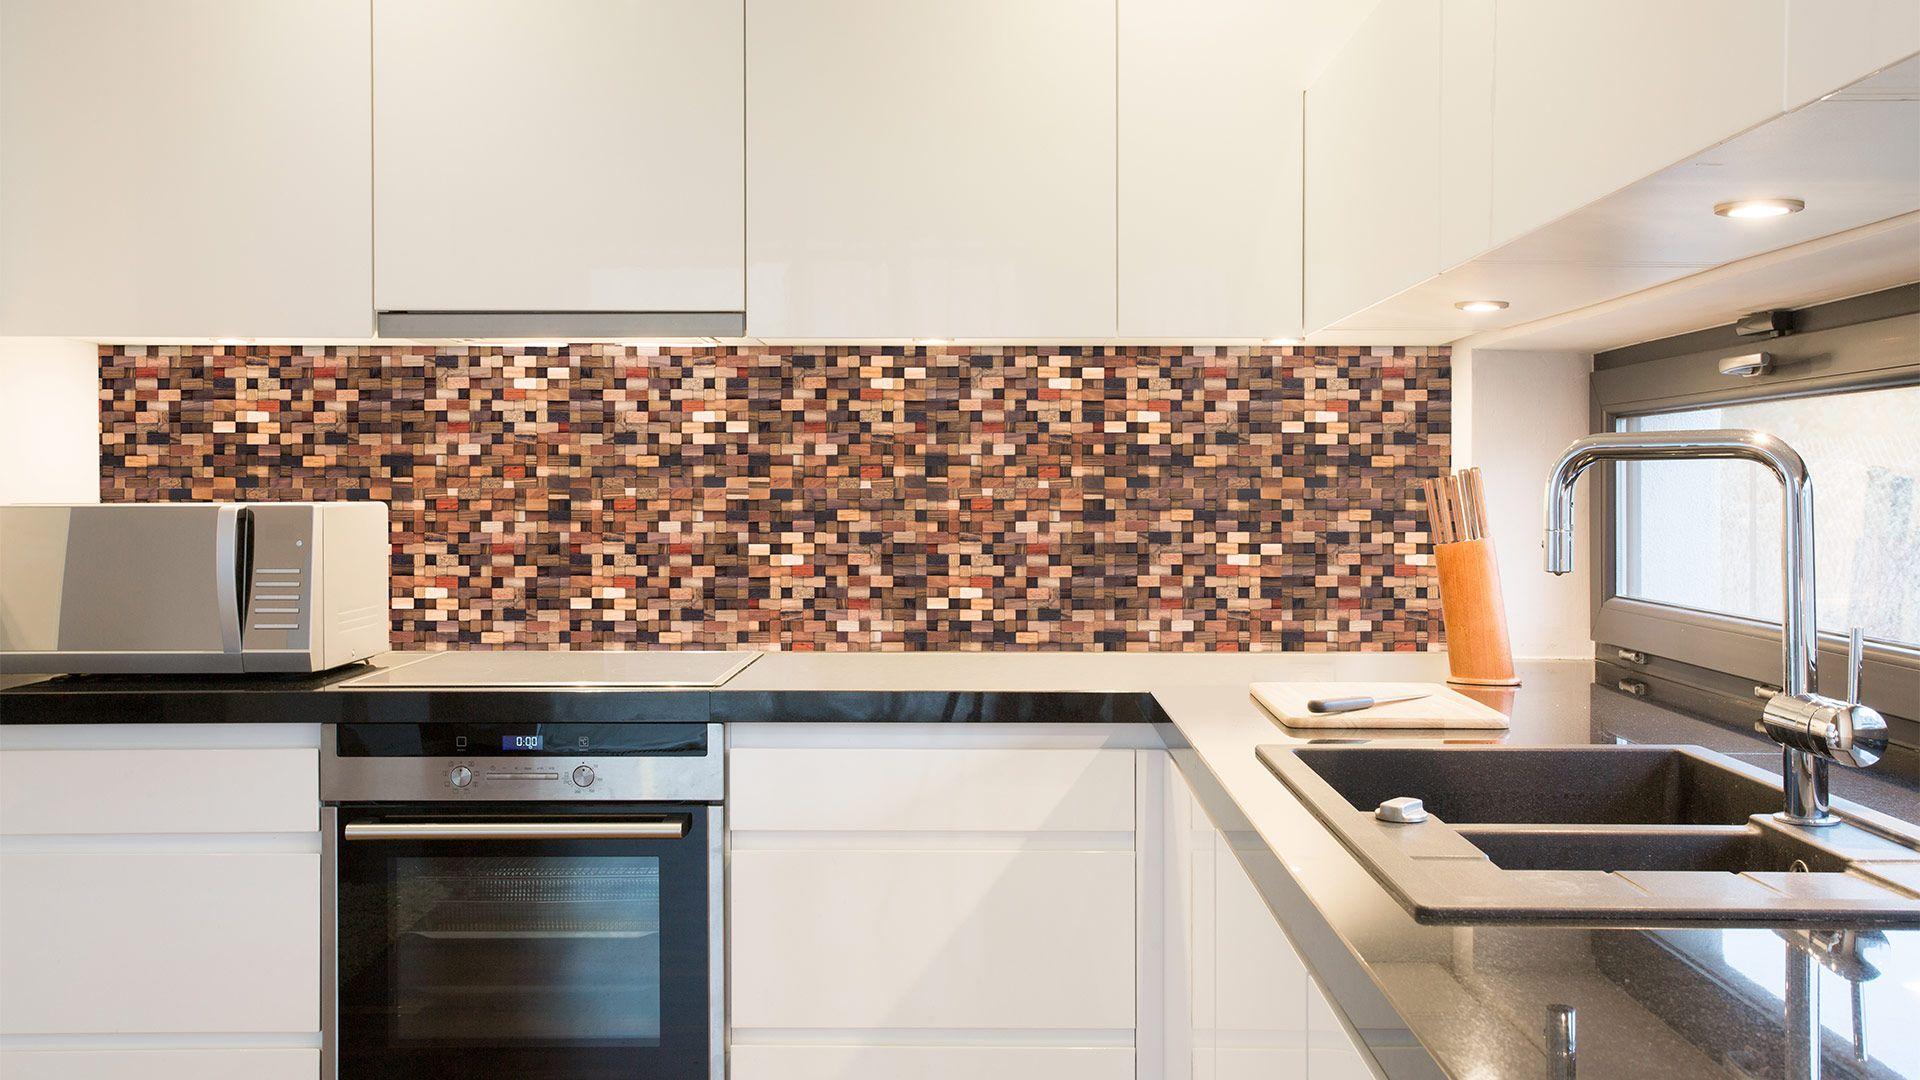 nwall wood mosaic kitchen backsplash nwall wood mosaic handmade rh pinterest com